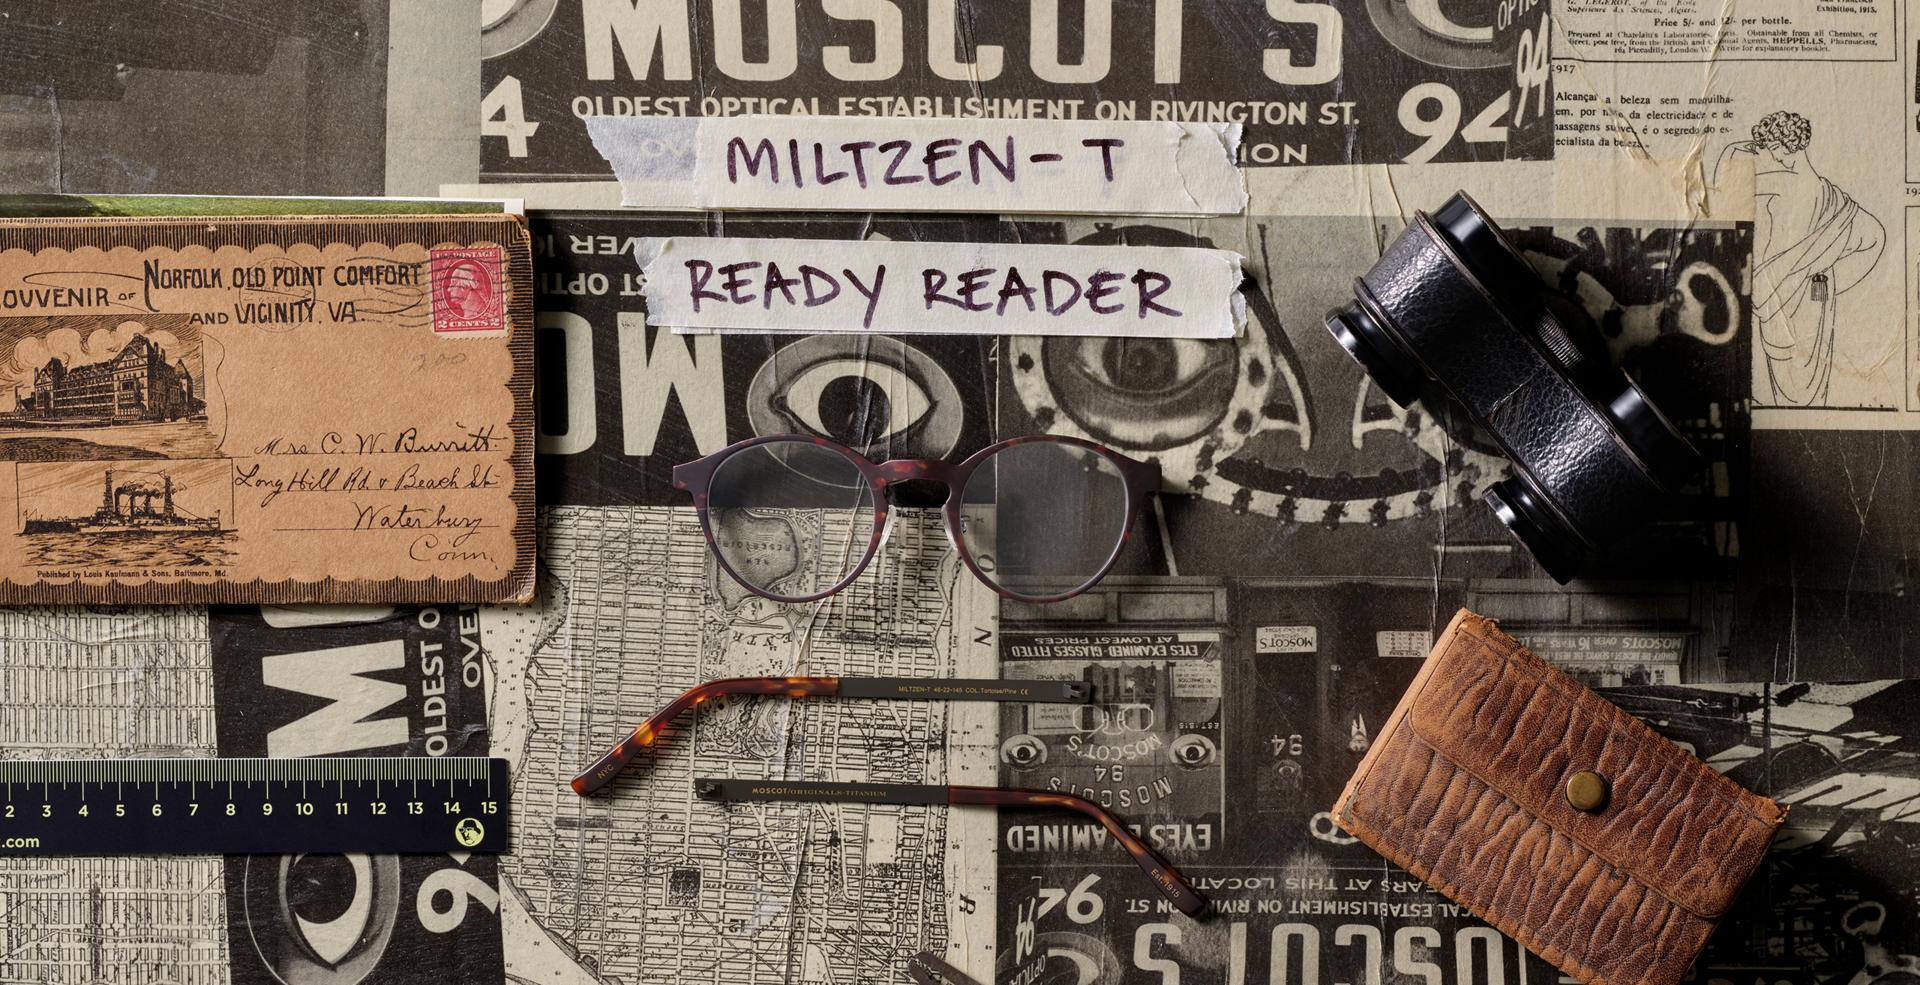 MILTZEN-T READY READER